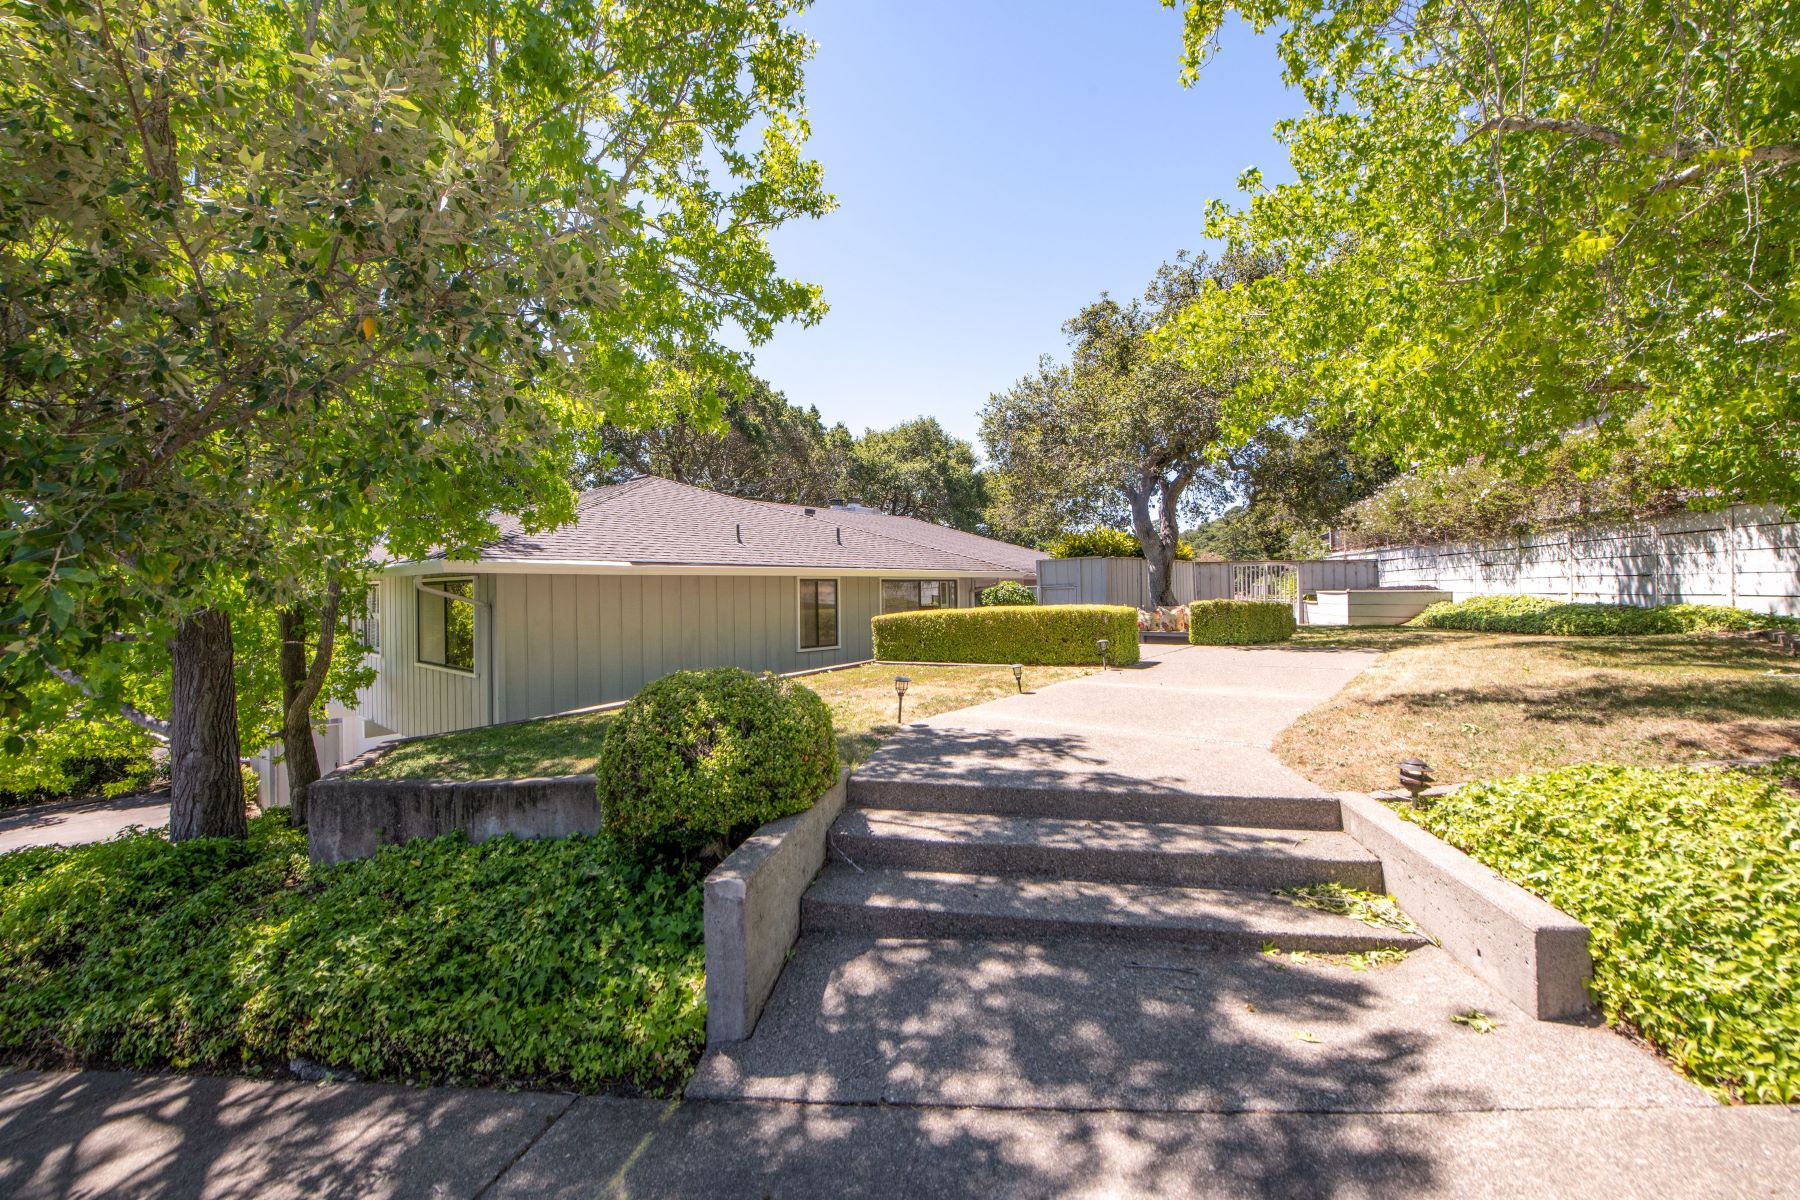 Single Family Homes for Sale at Peacock Gap Water Views 27 McNear Drive, San Rafael, California 94901 United States